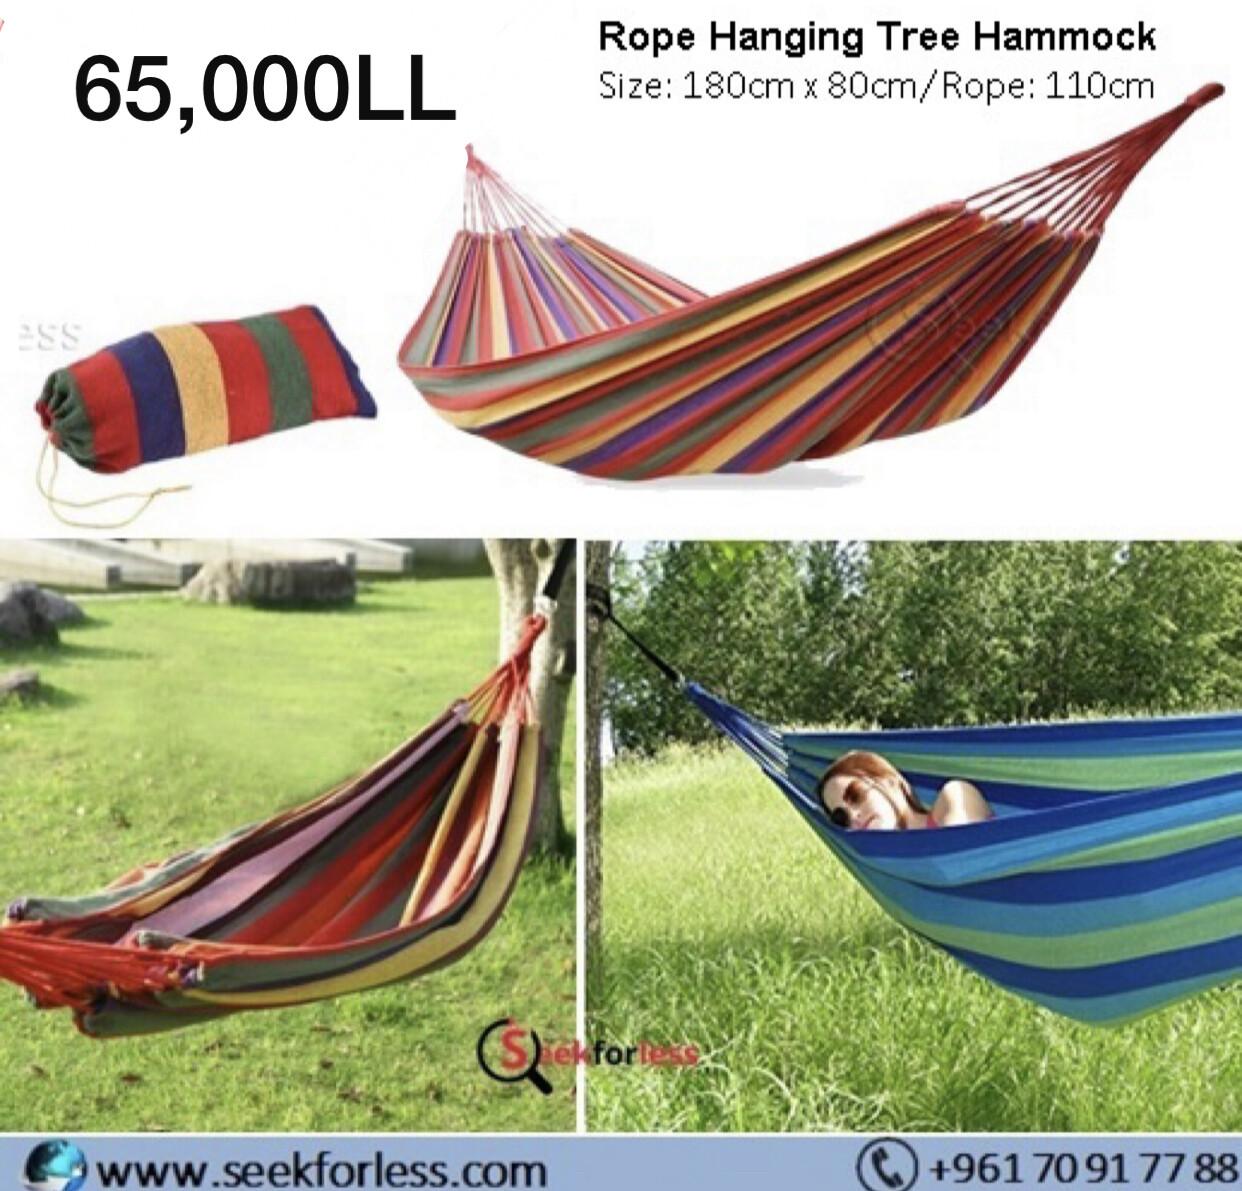 Rope Hanging Tree Hammock